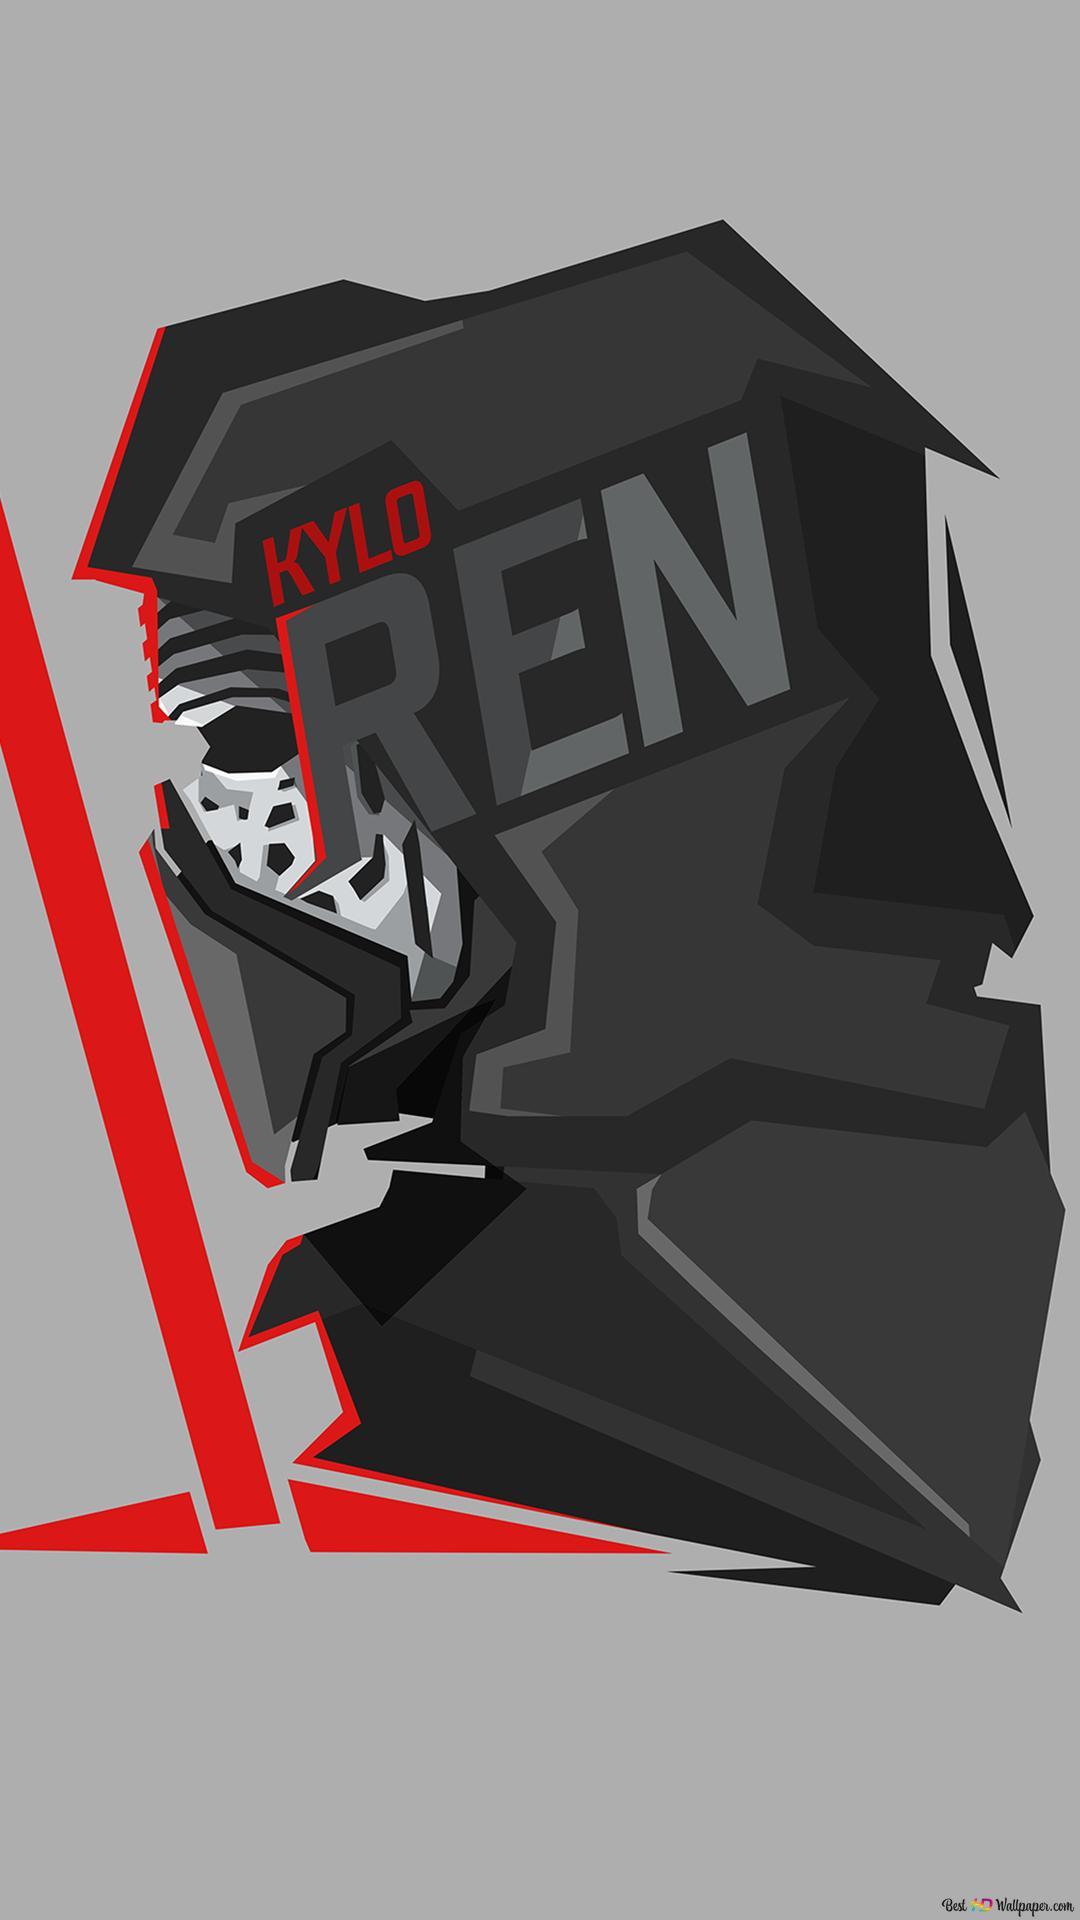 Star Wars Kylo Ren In Gray Wallpaper Minimalist Hd Wallpaper Download